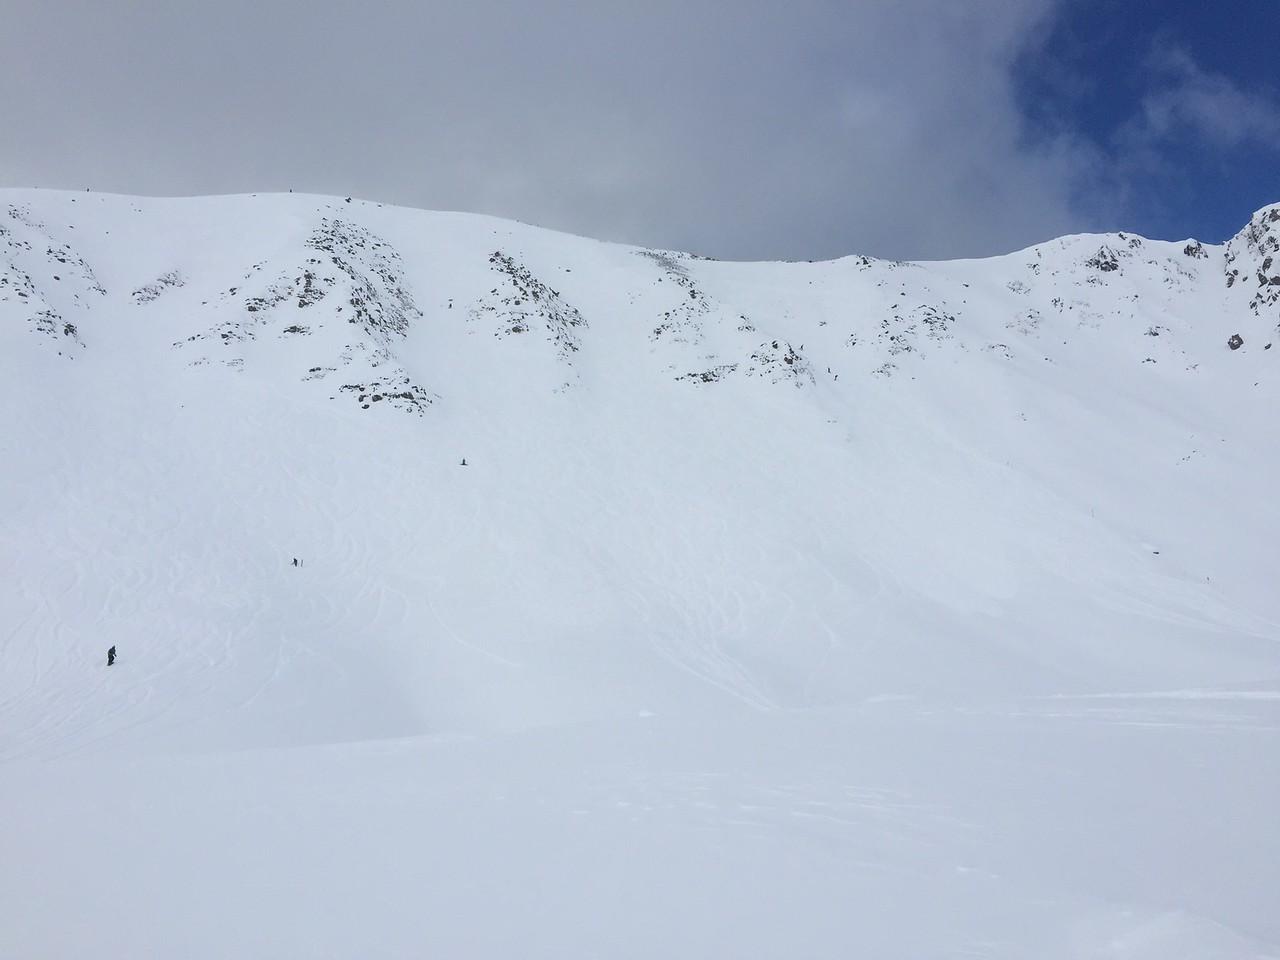 Fresh tracks and sweet powder. Pretty steep too. We just hit that!